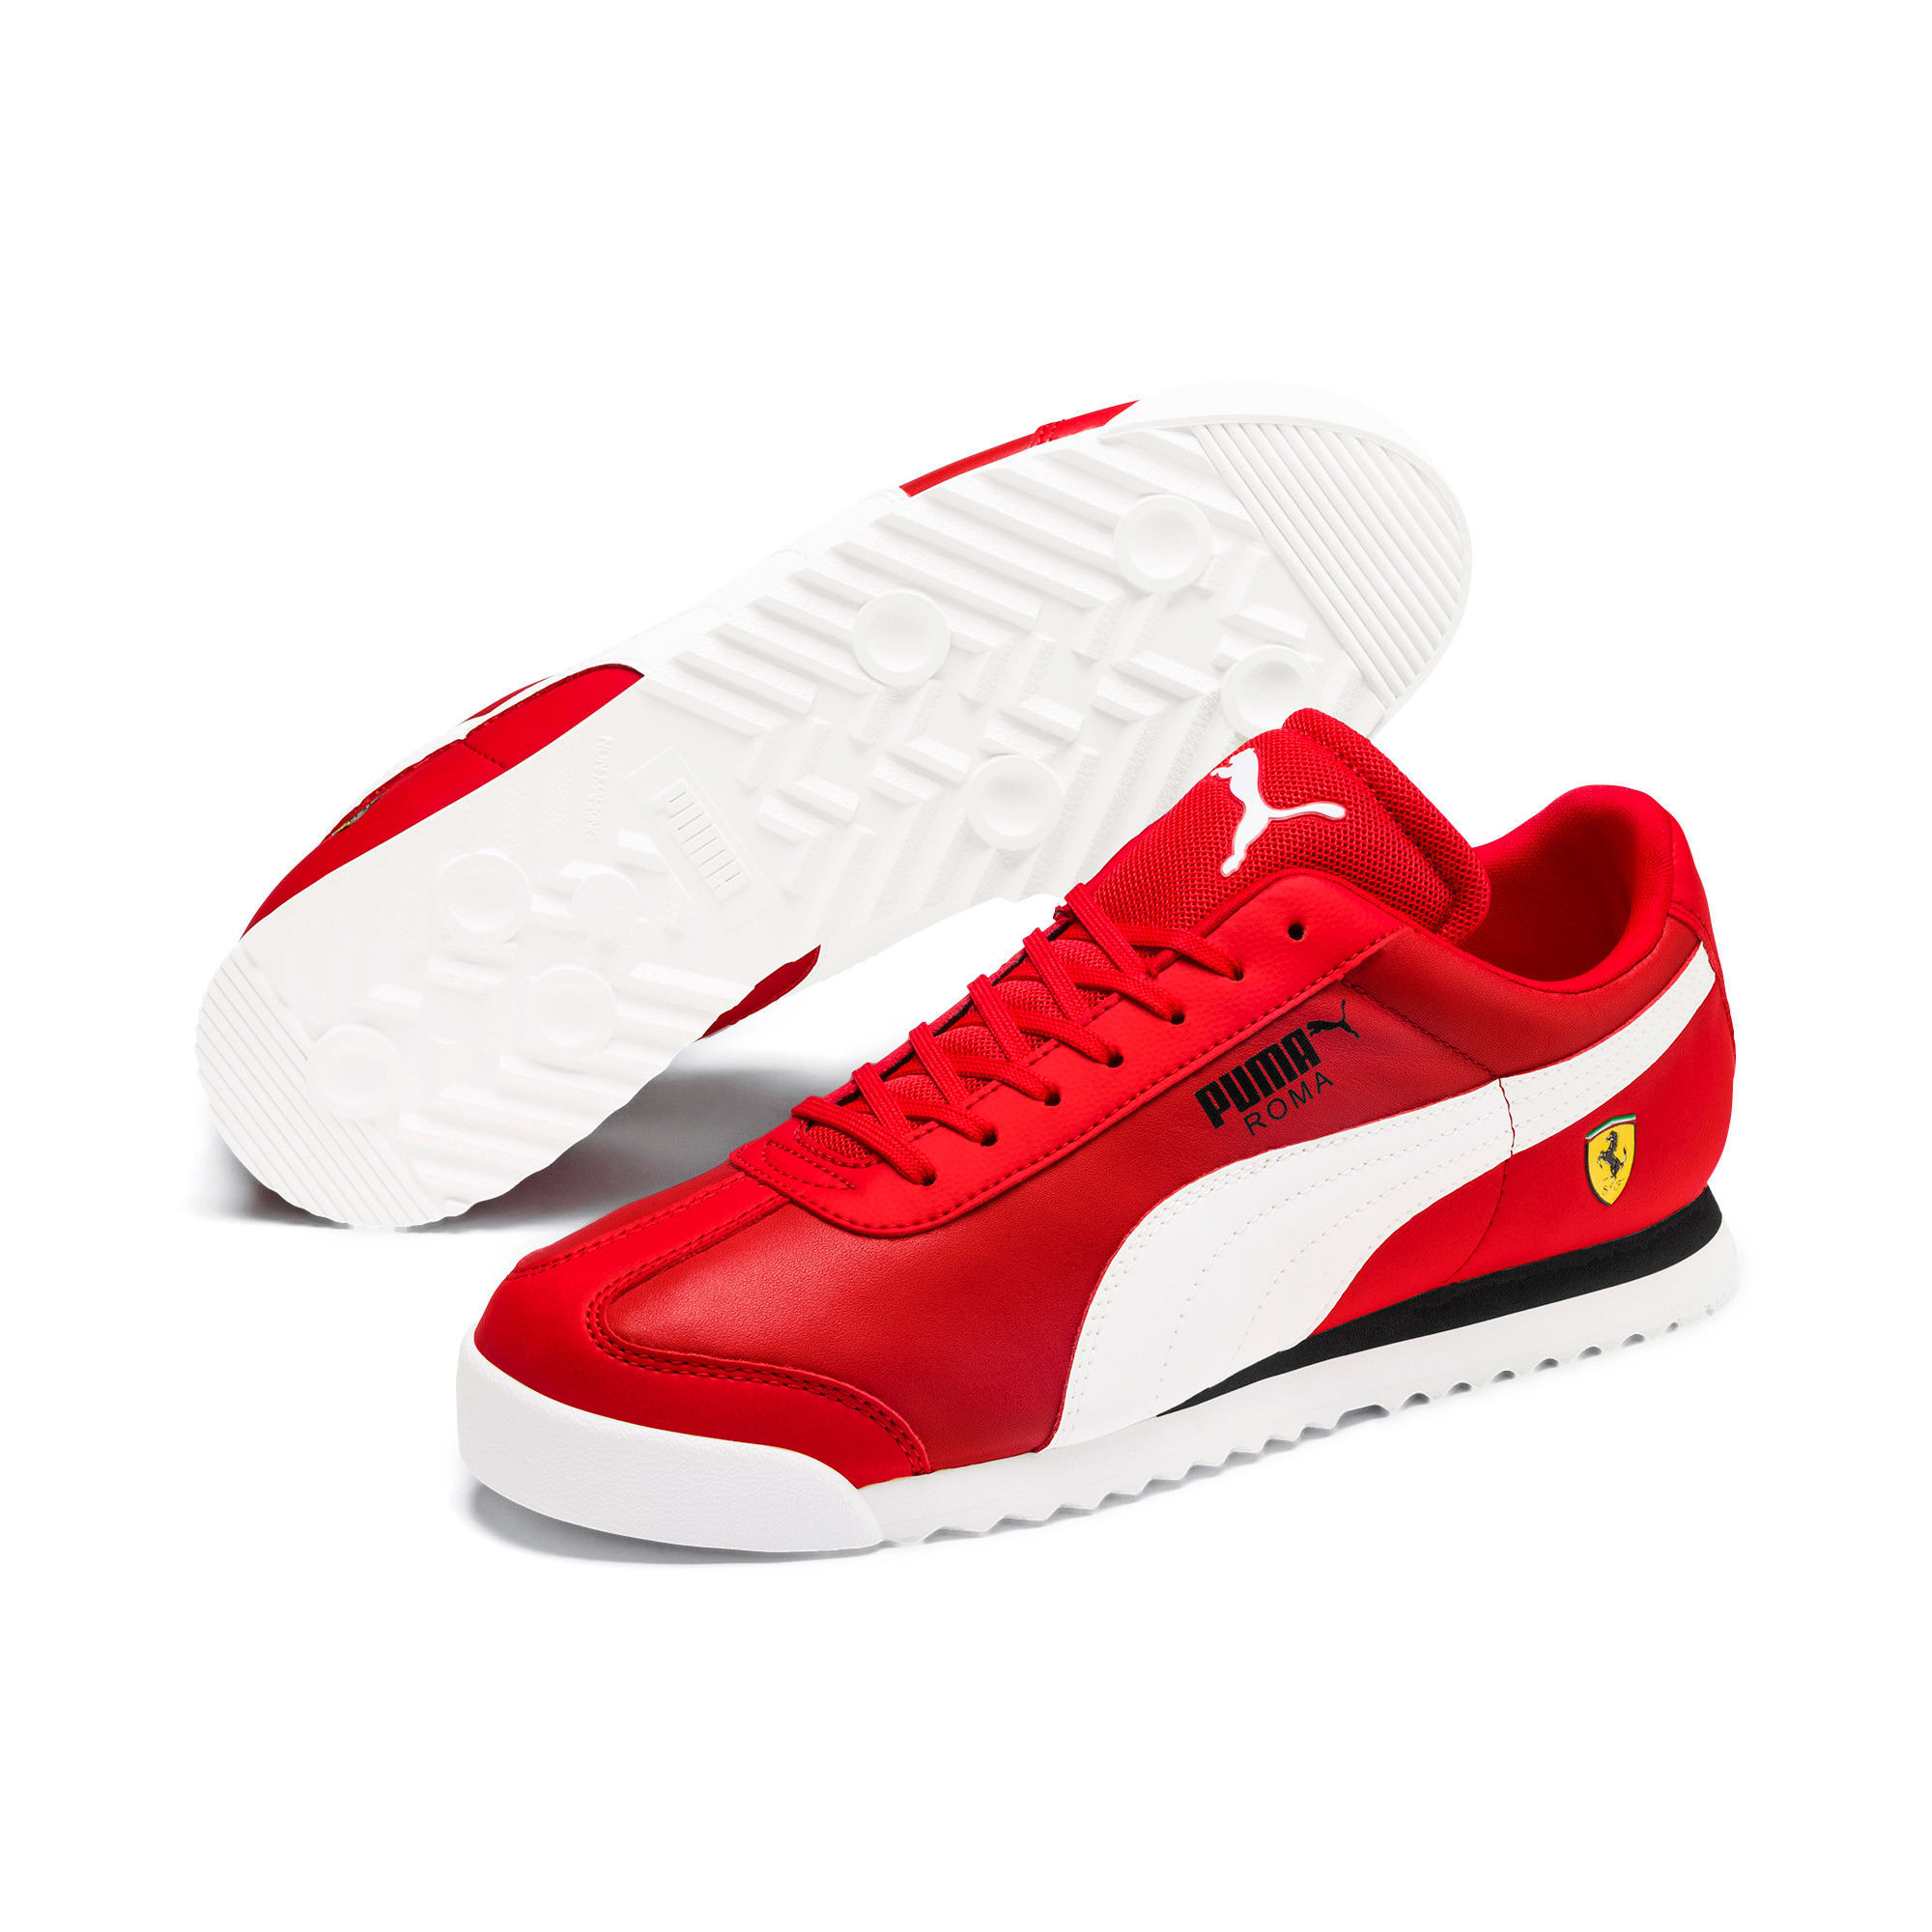 Miniatura 3 de Zapatos deportivos Scuderia Ferrari Roma para hombre, Rosso Corsa-White-Black, mediano